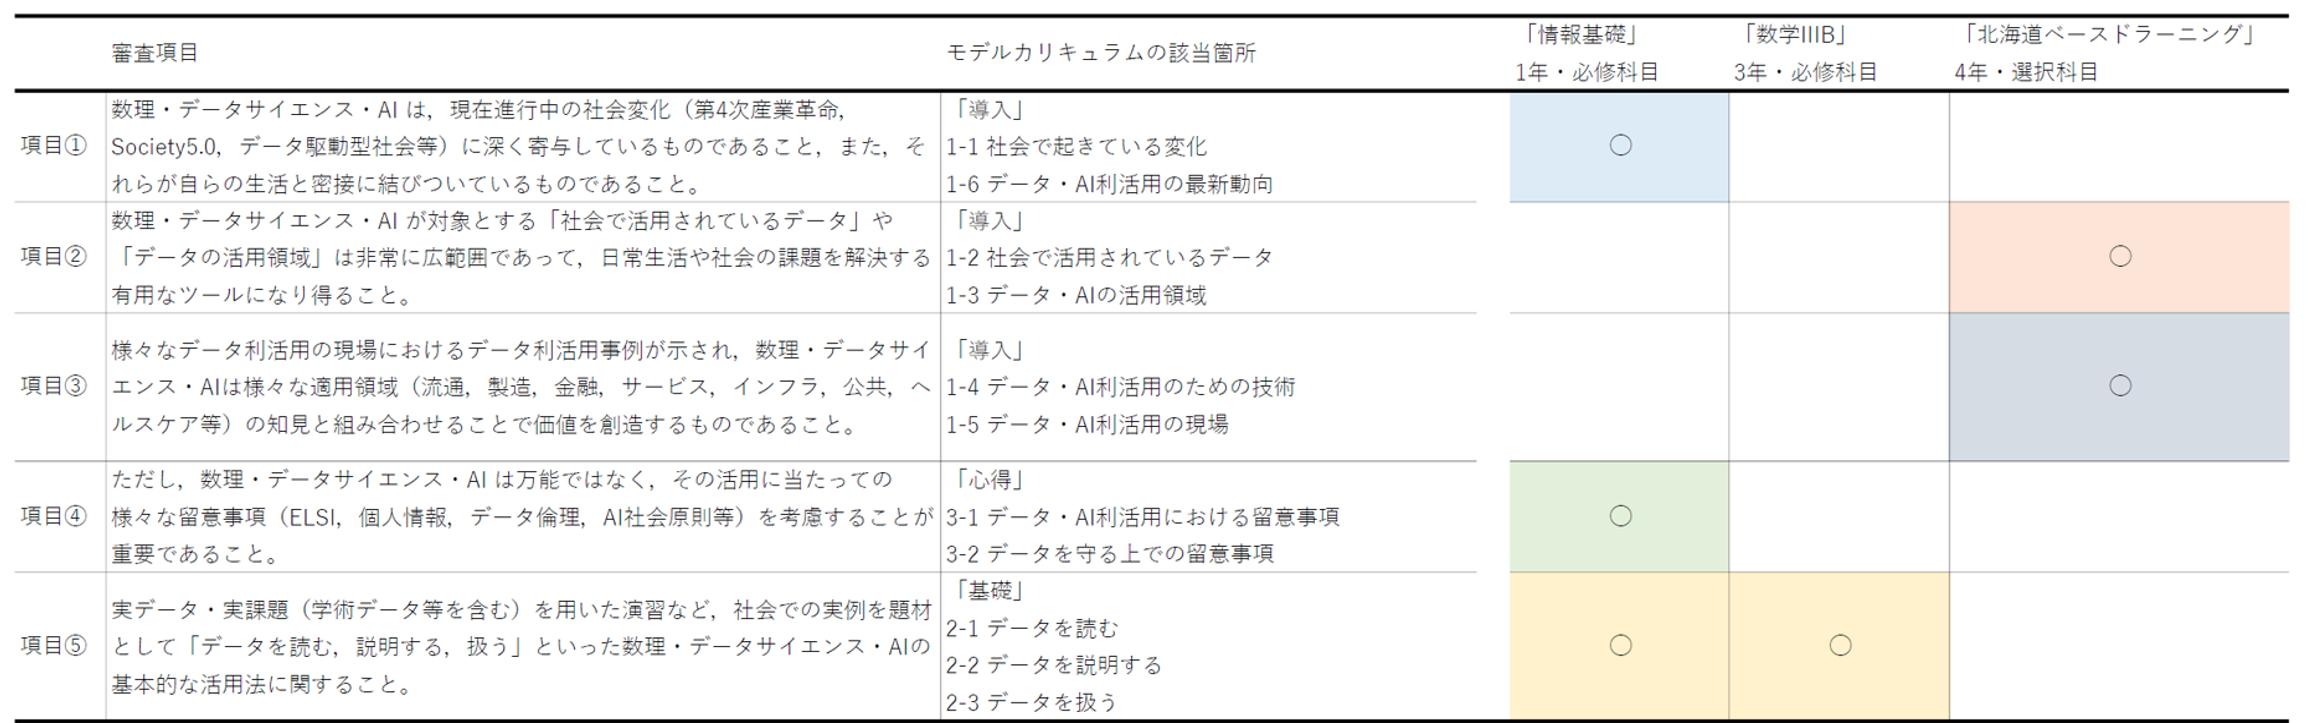 https://www.asahikawa-nct.ac.jp/COMPASS/img/p2.PNG